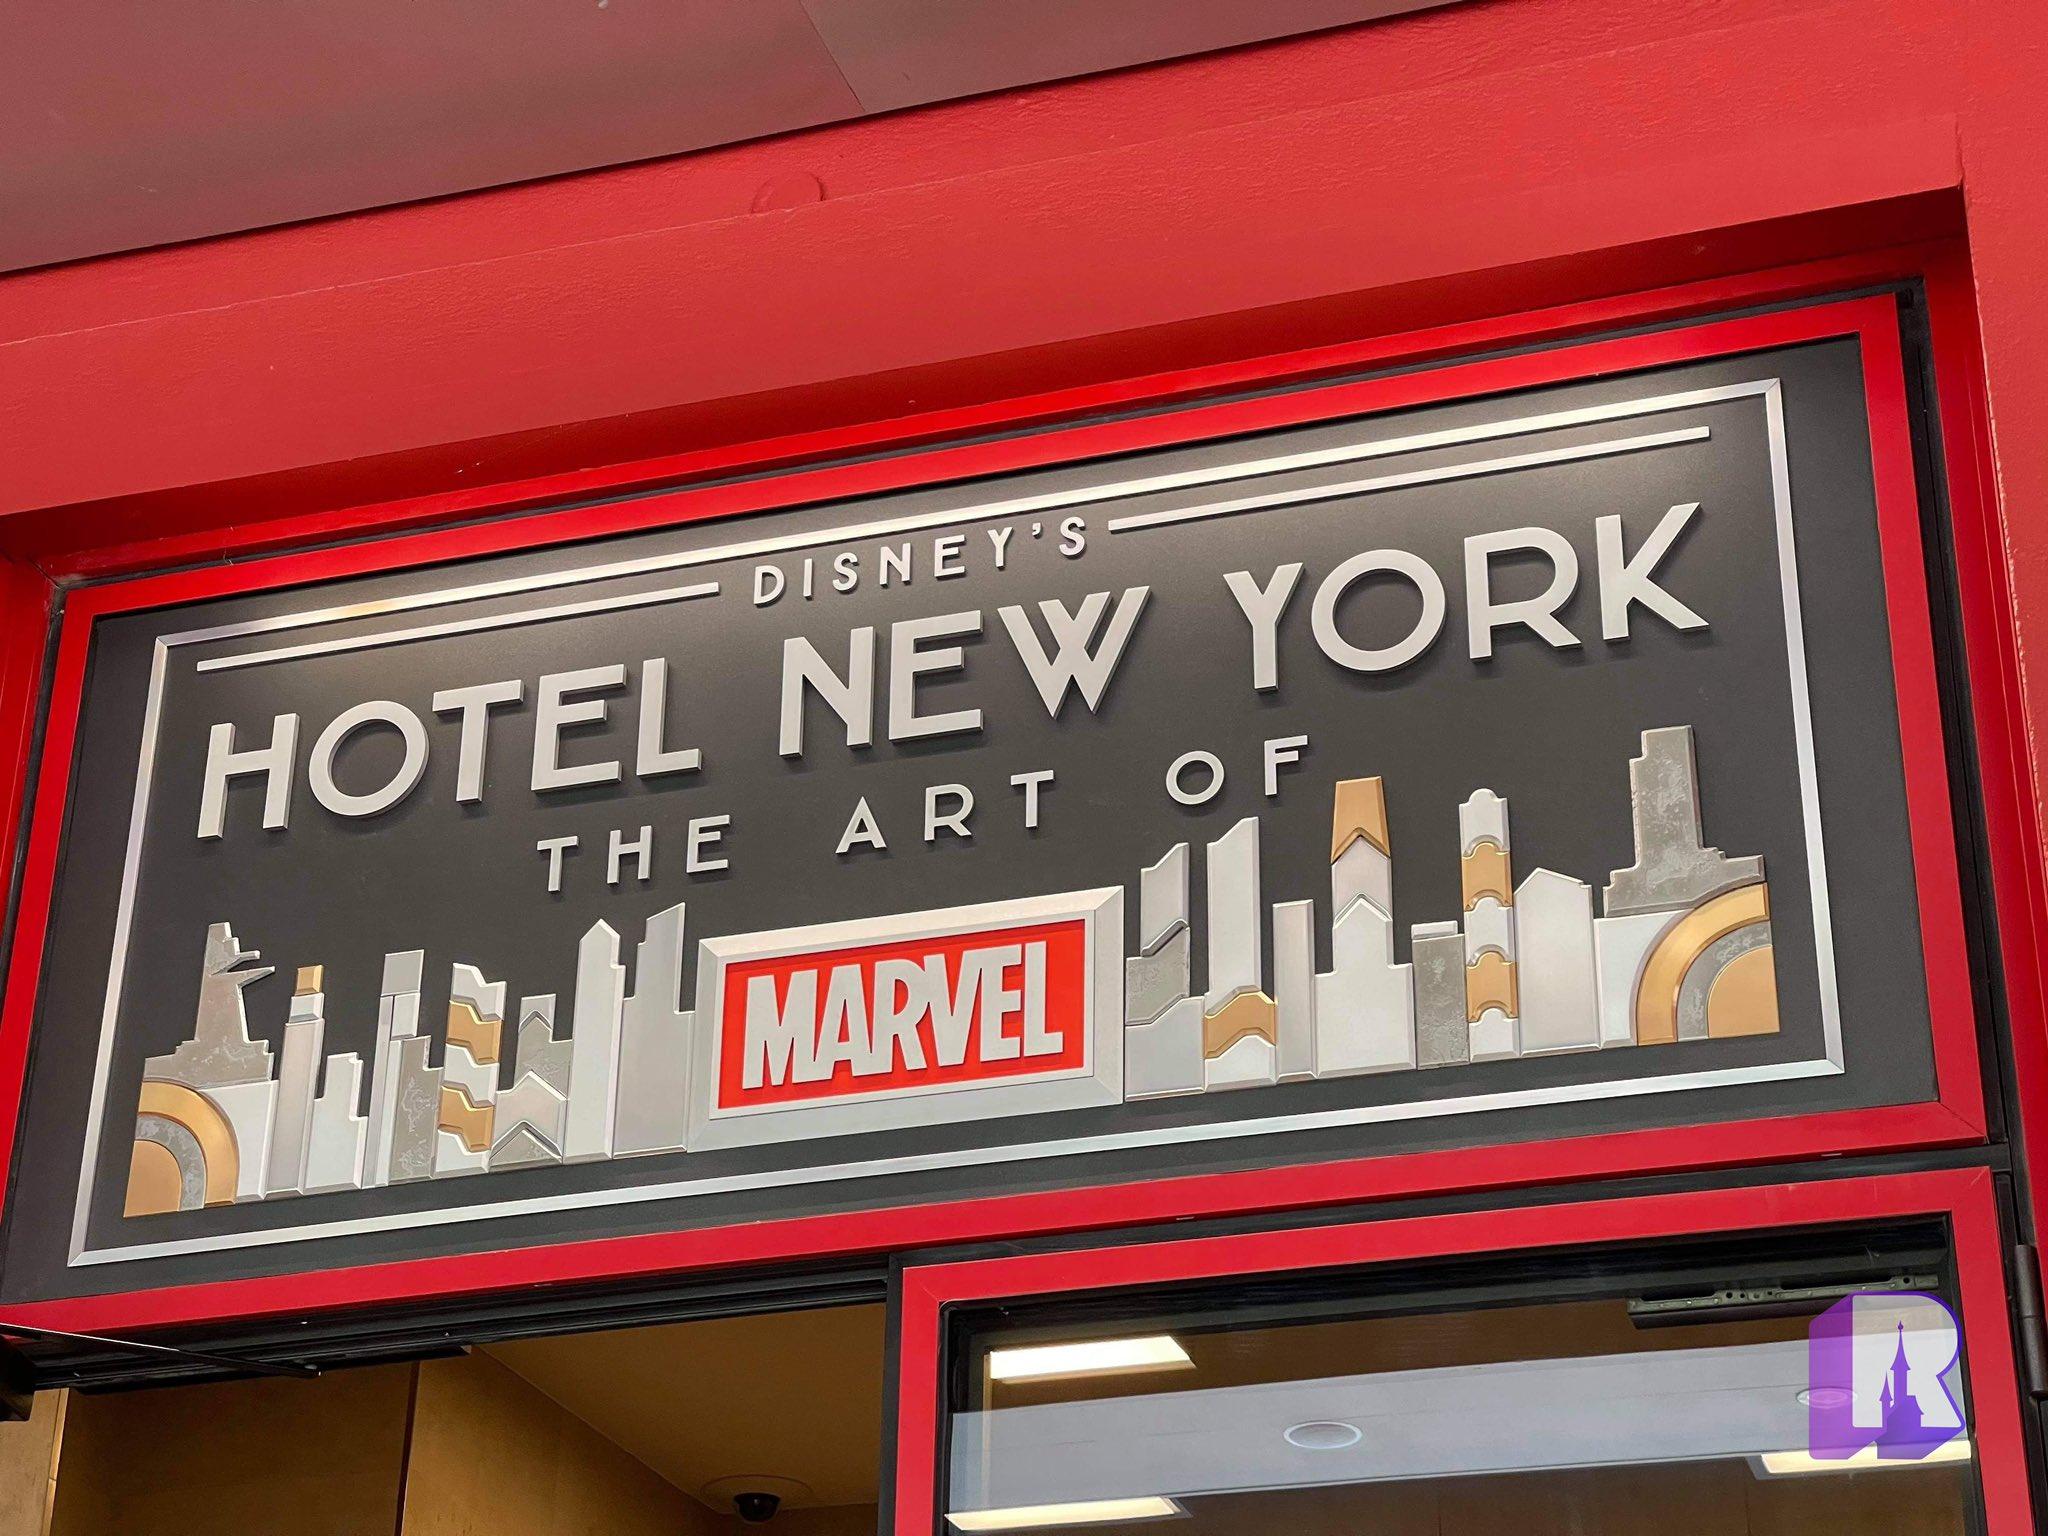 Disney's Hotel New York - The Art of Marvel - Pagina 3 E29vlm10